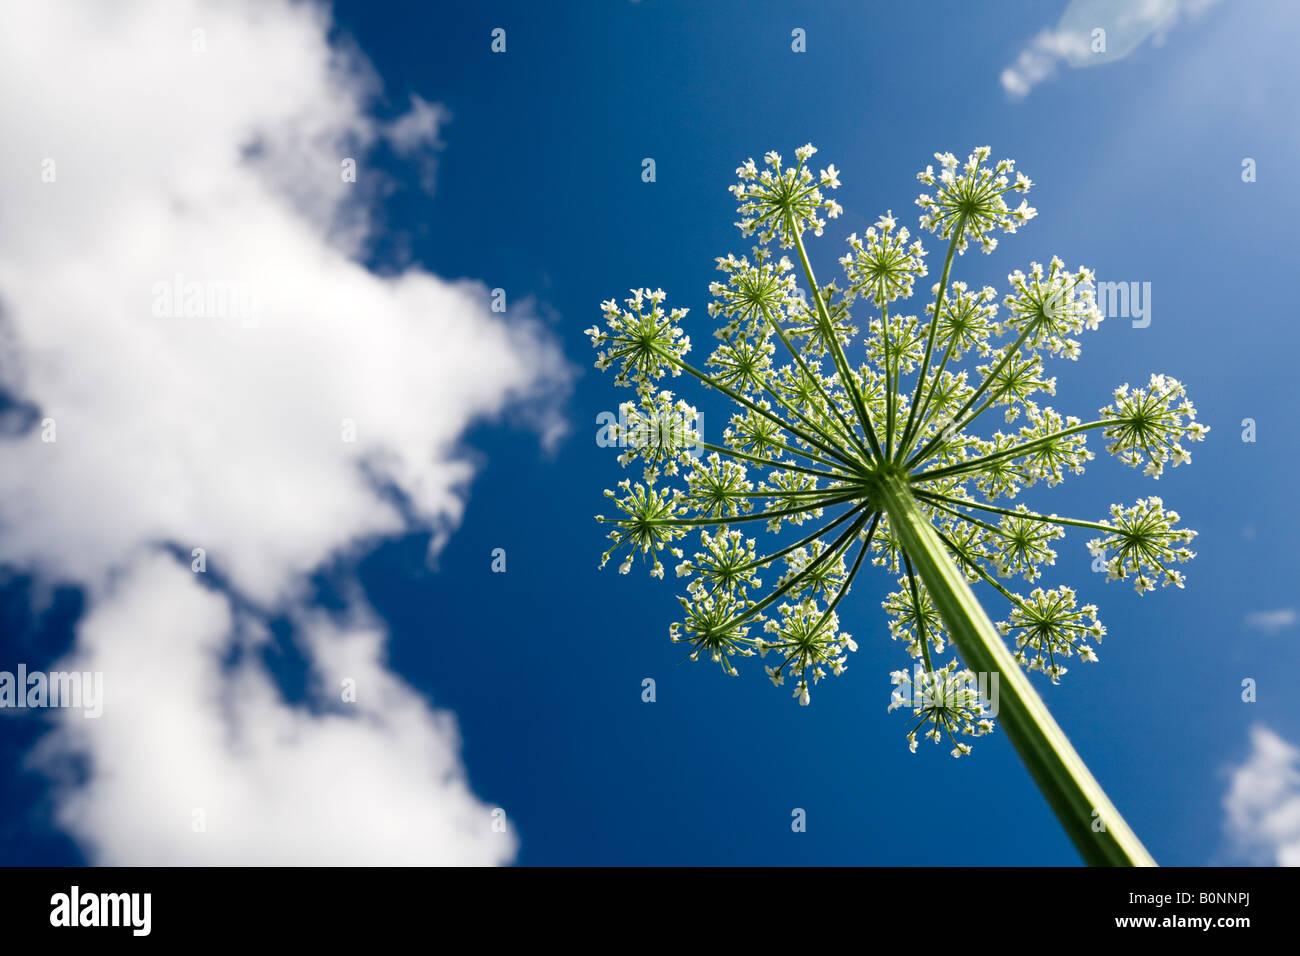 Un giardino in fiore ombrella angelica (Angelica archangelica). Ombelle d'angélique officinale en fleurs, Immagini Stock